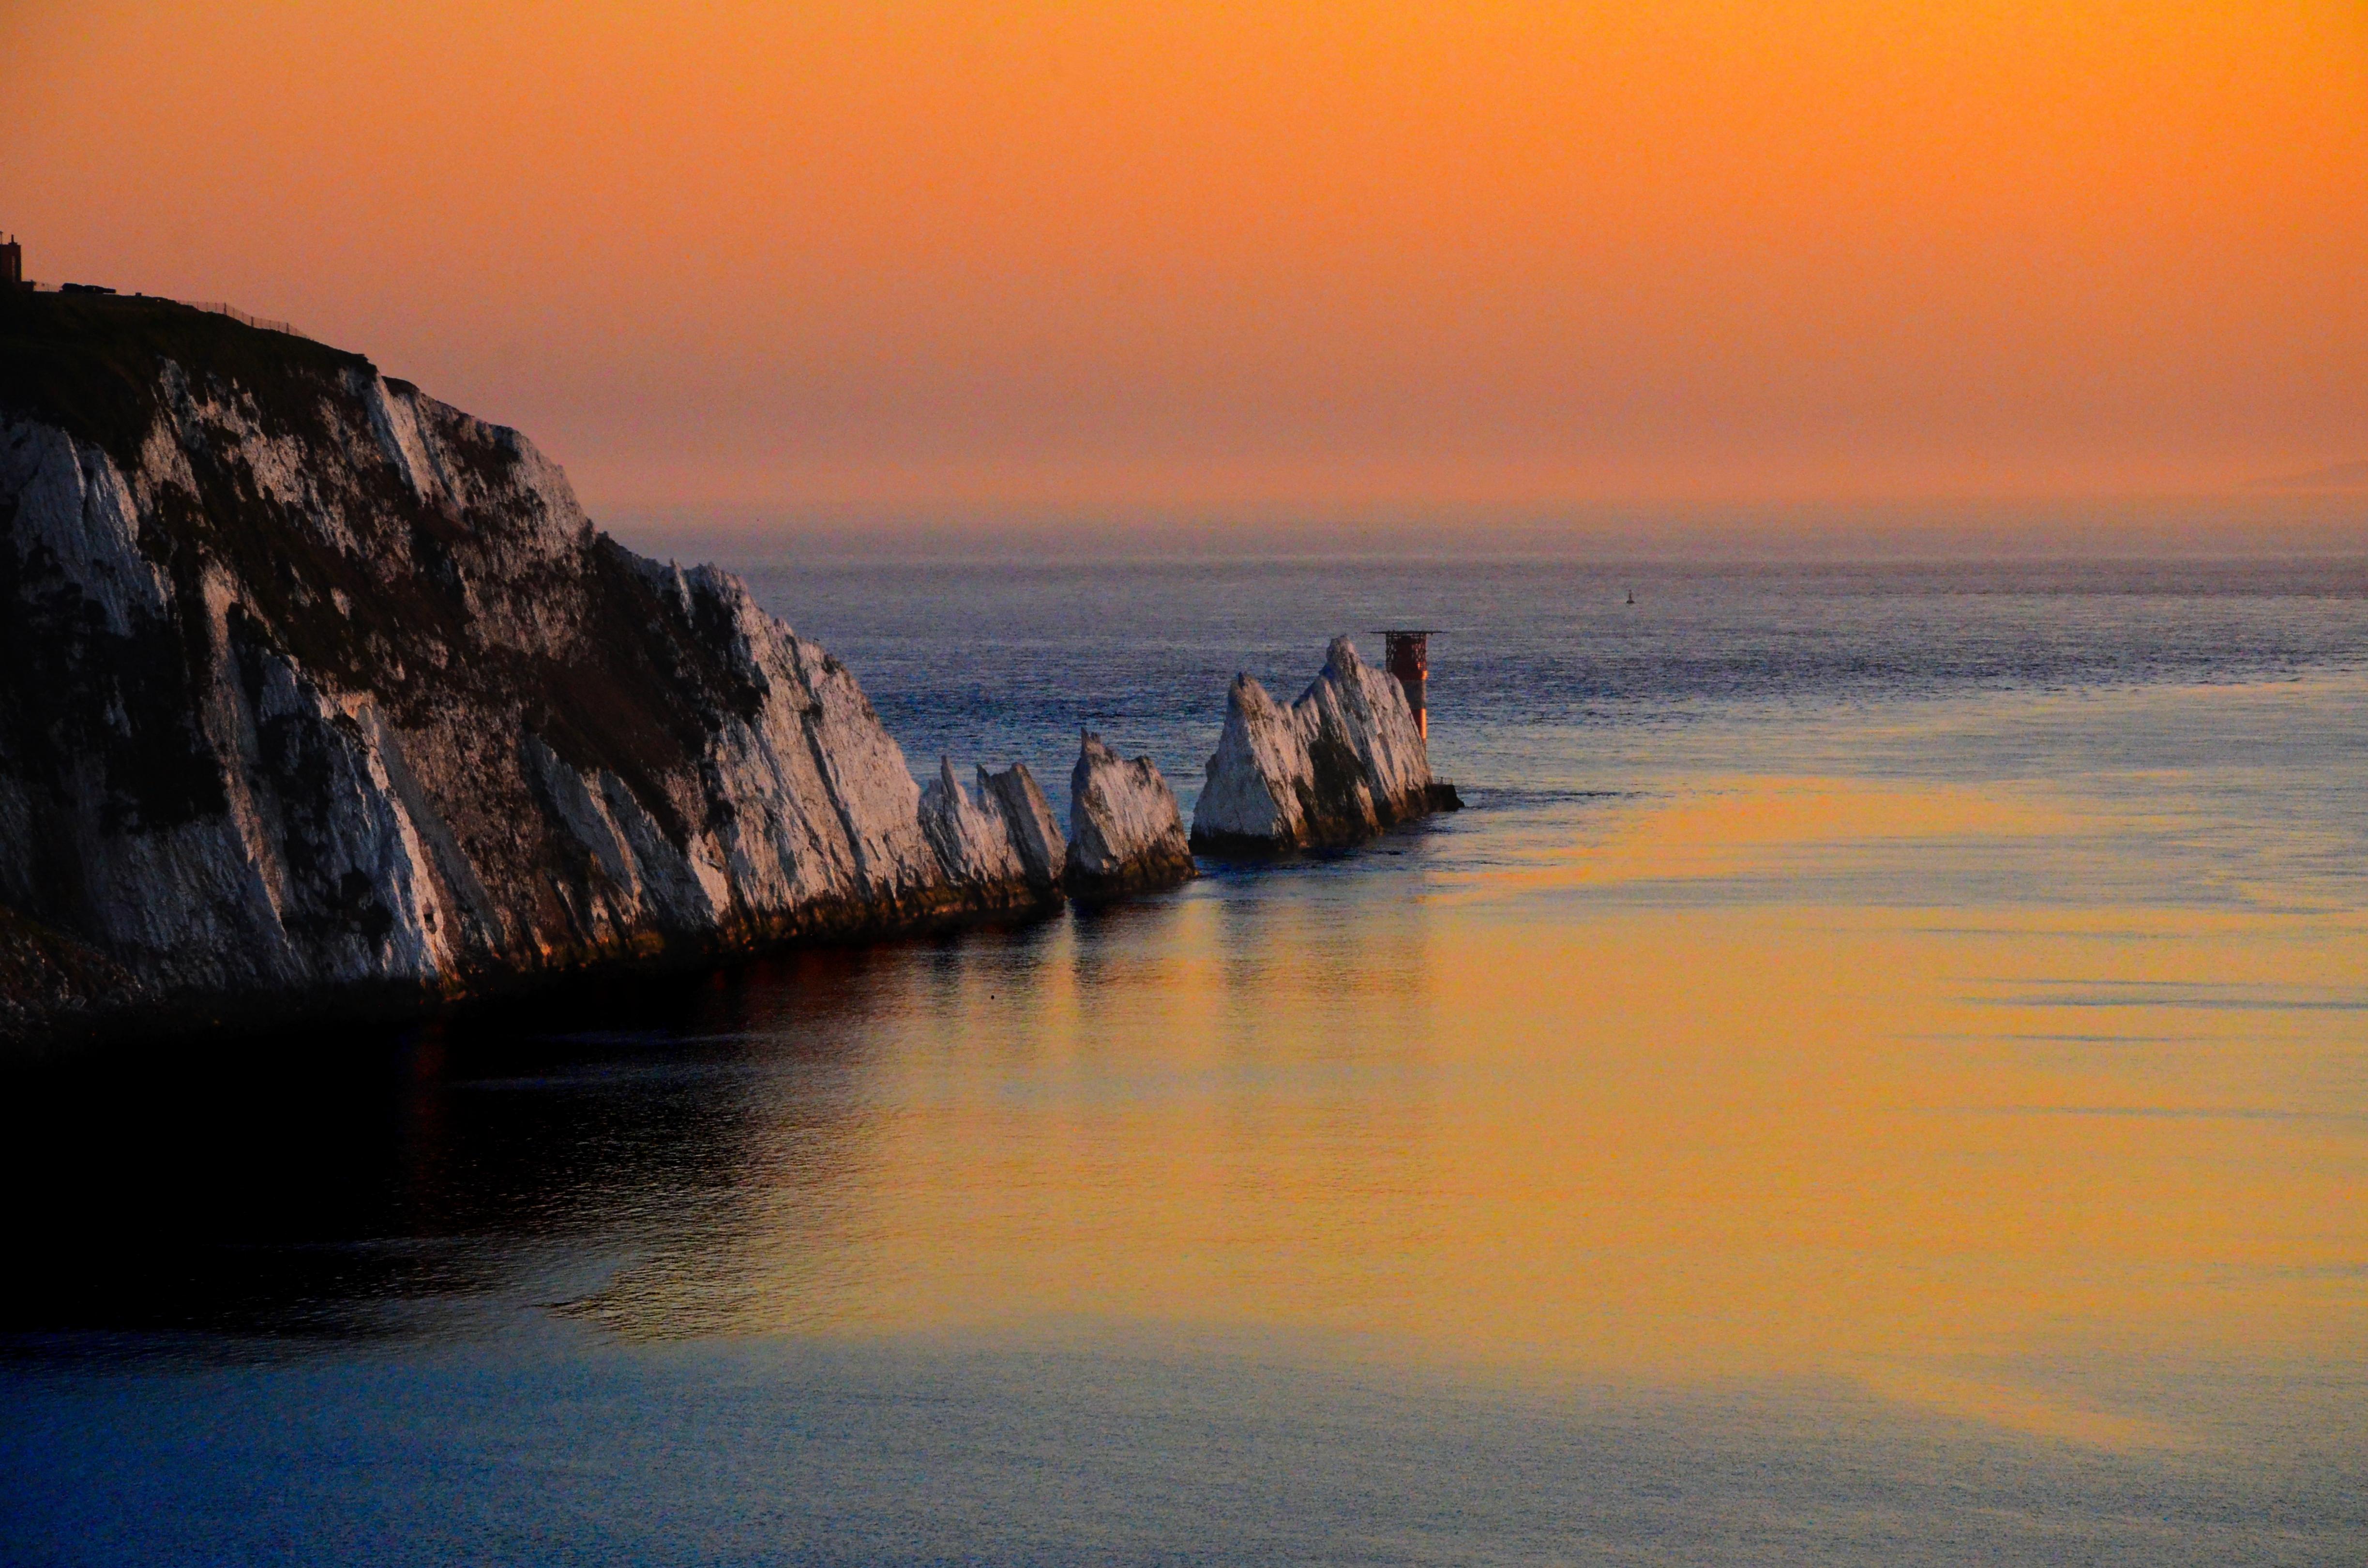 Lighthouse - Sunset